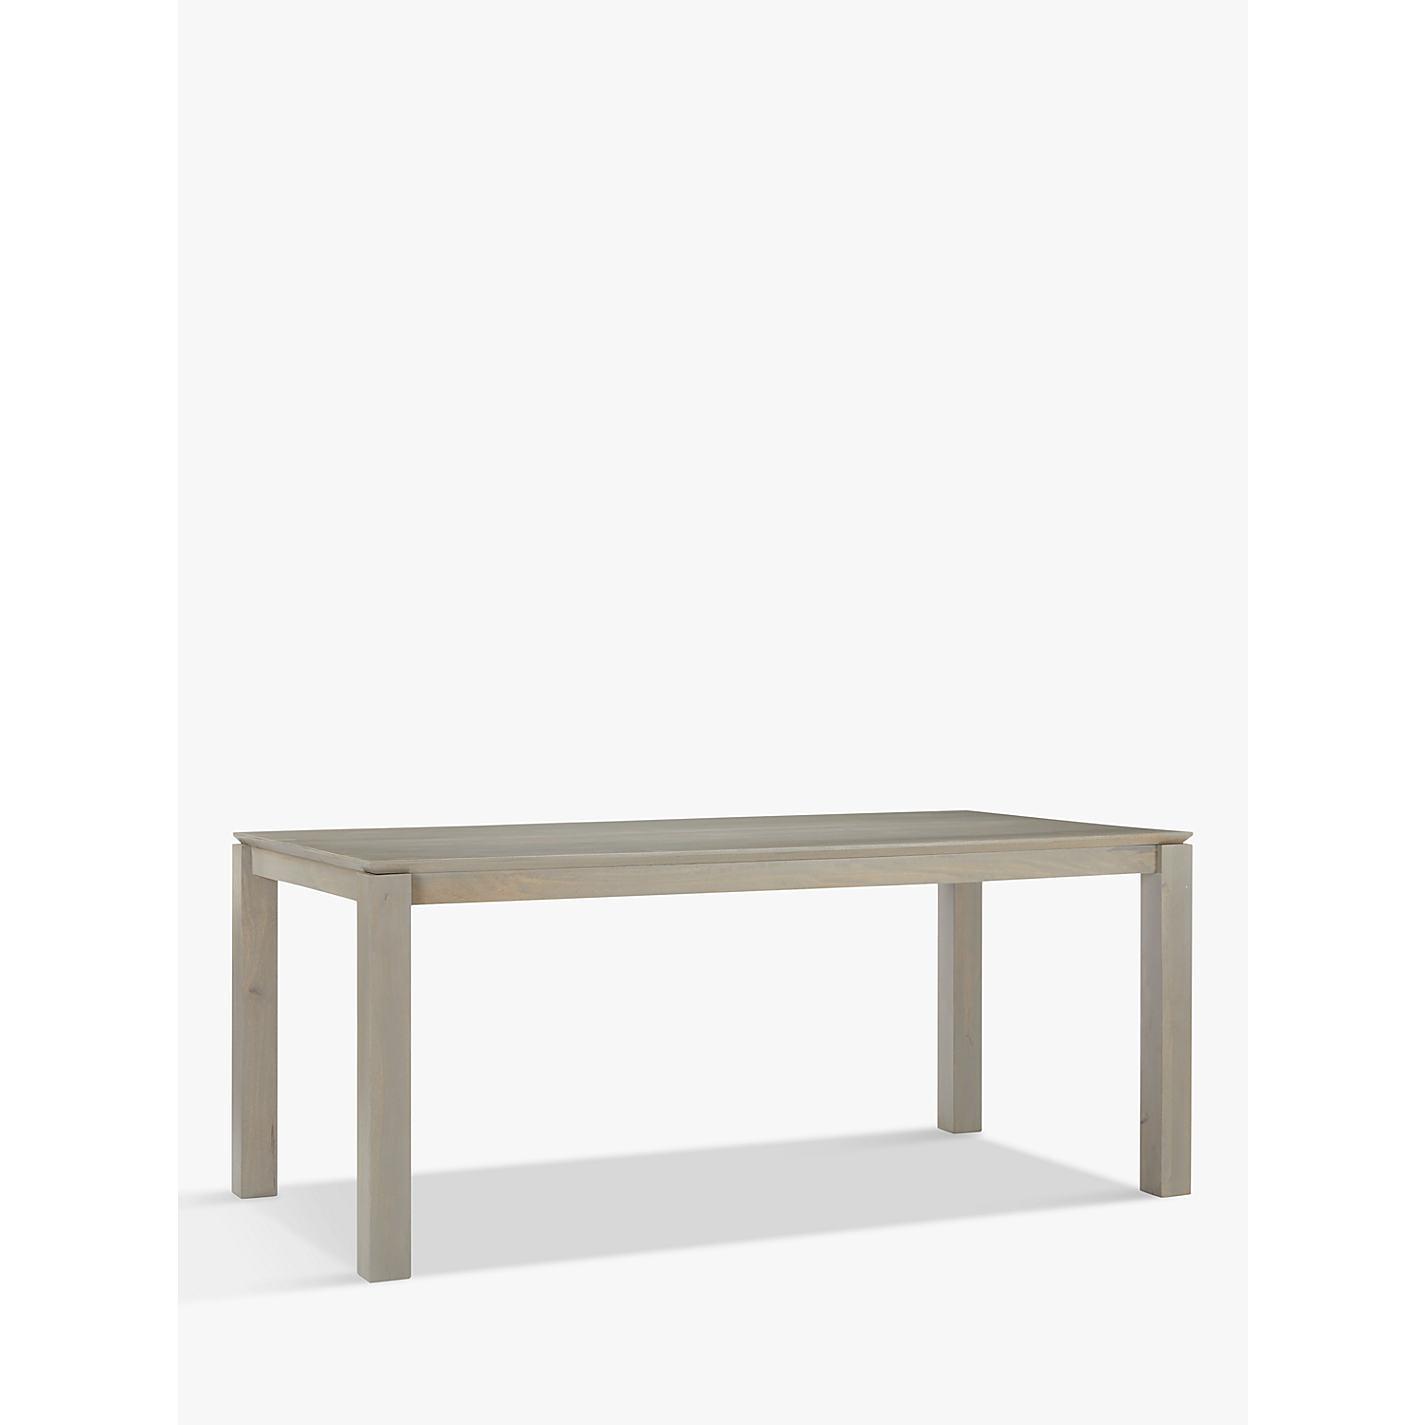 Buy John Lewis Asha Wooden 6 8 Seater Dining Table